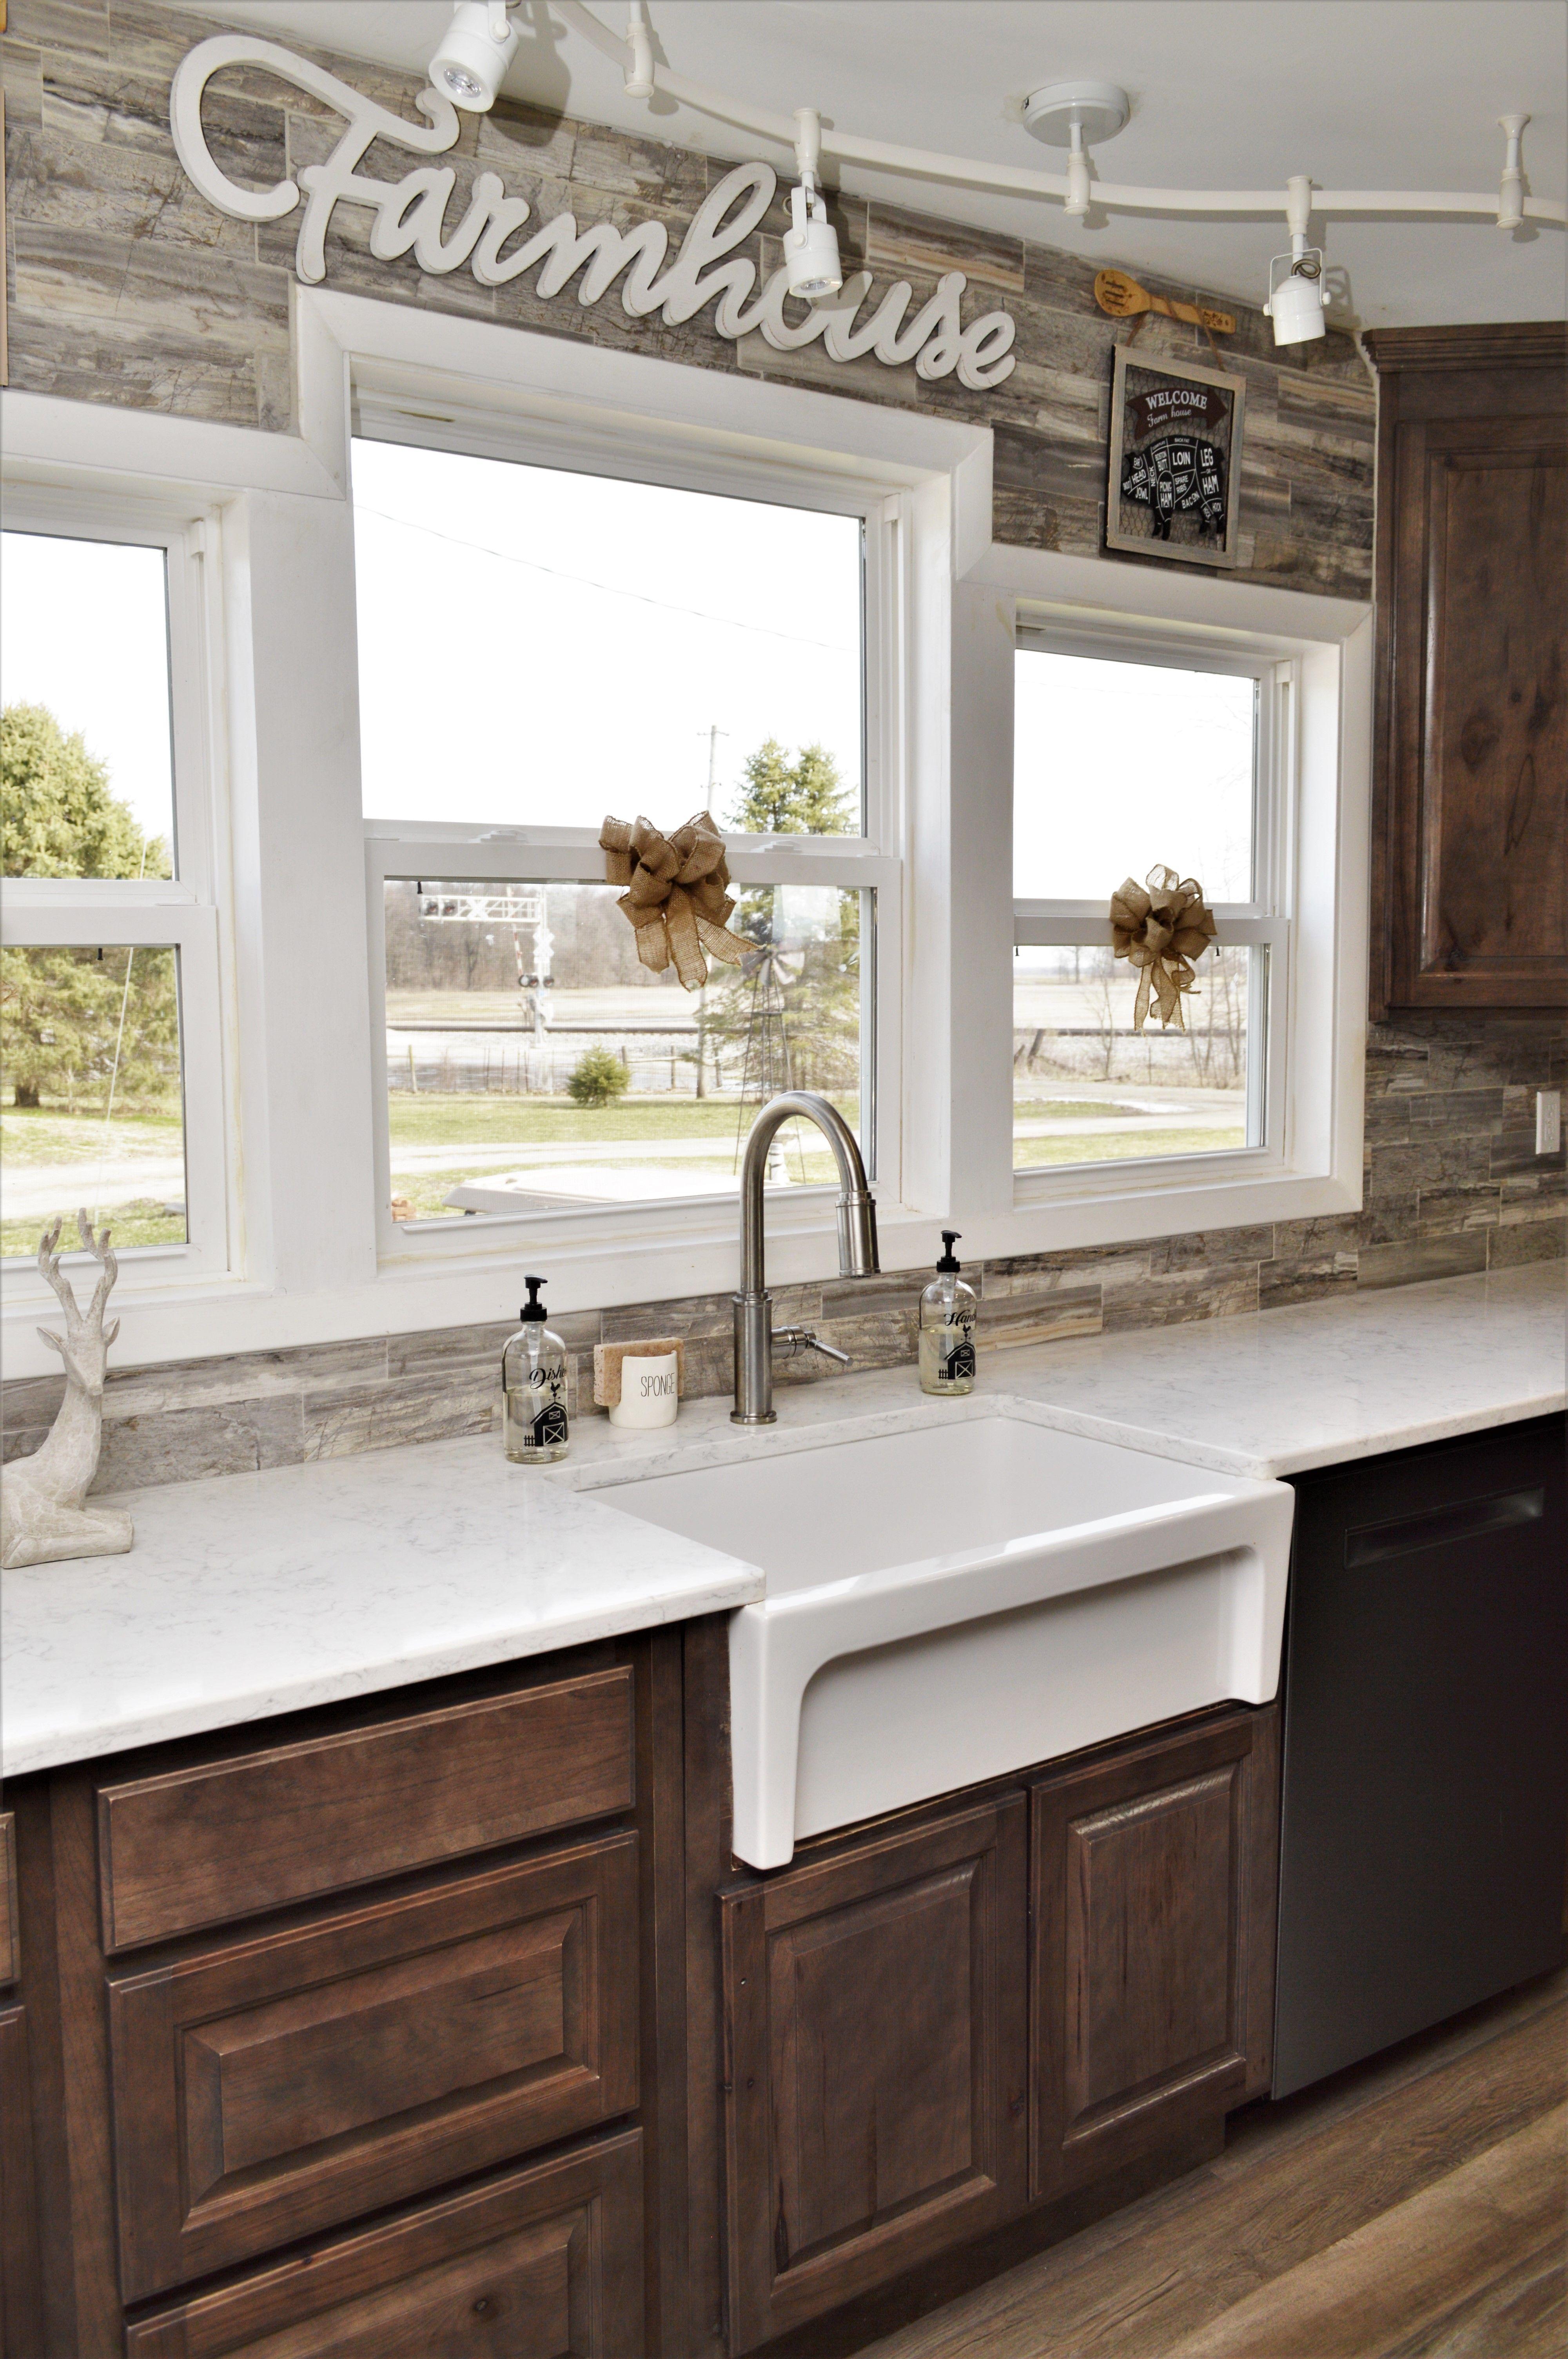 Bailey S Cabinets Nantucket Single Bowl Undermount Sink Kitchen Cabinet Home Decor